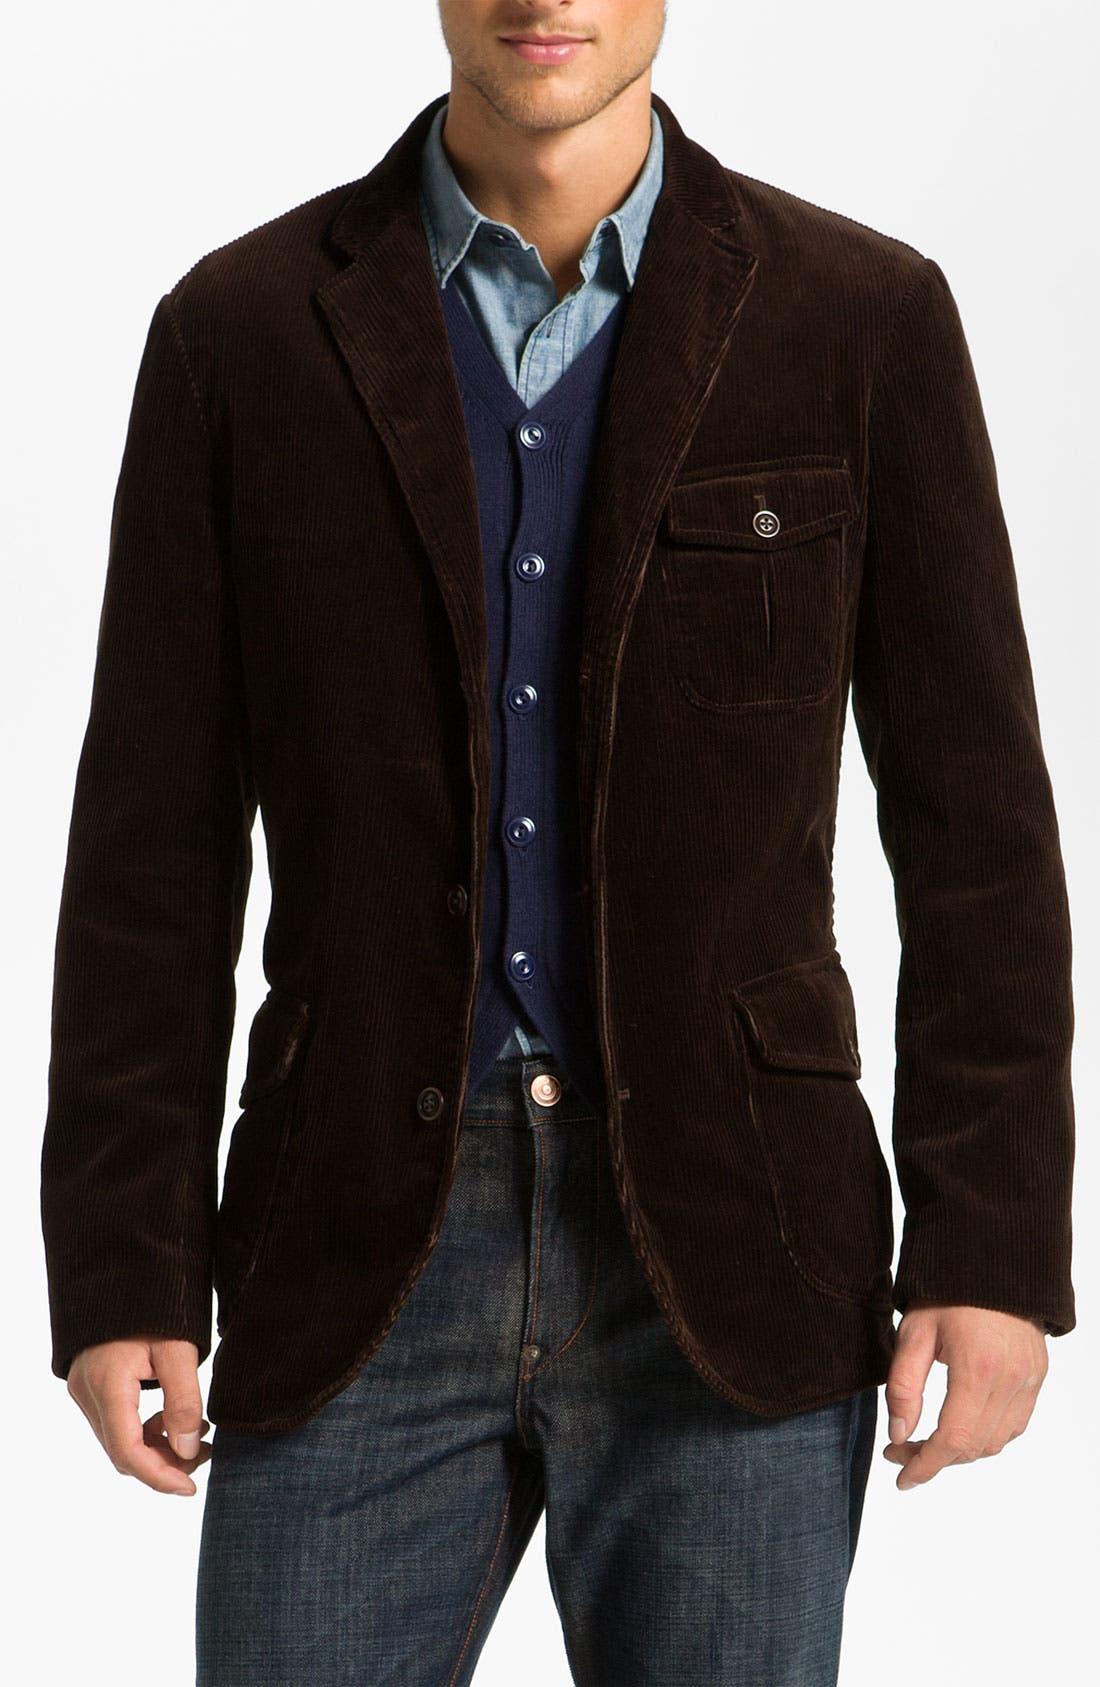 Alternate Image 1 Selected - Façonnable Denim Corduroy Sportcoat